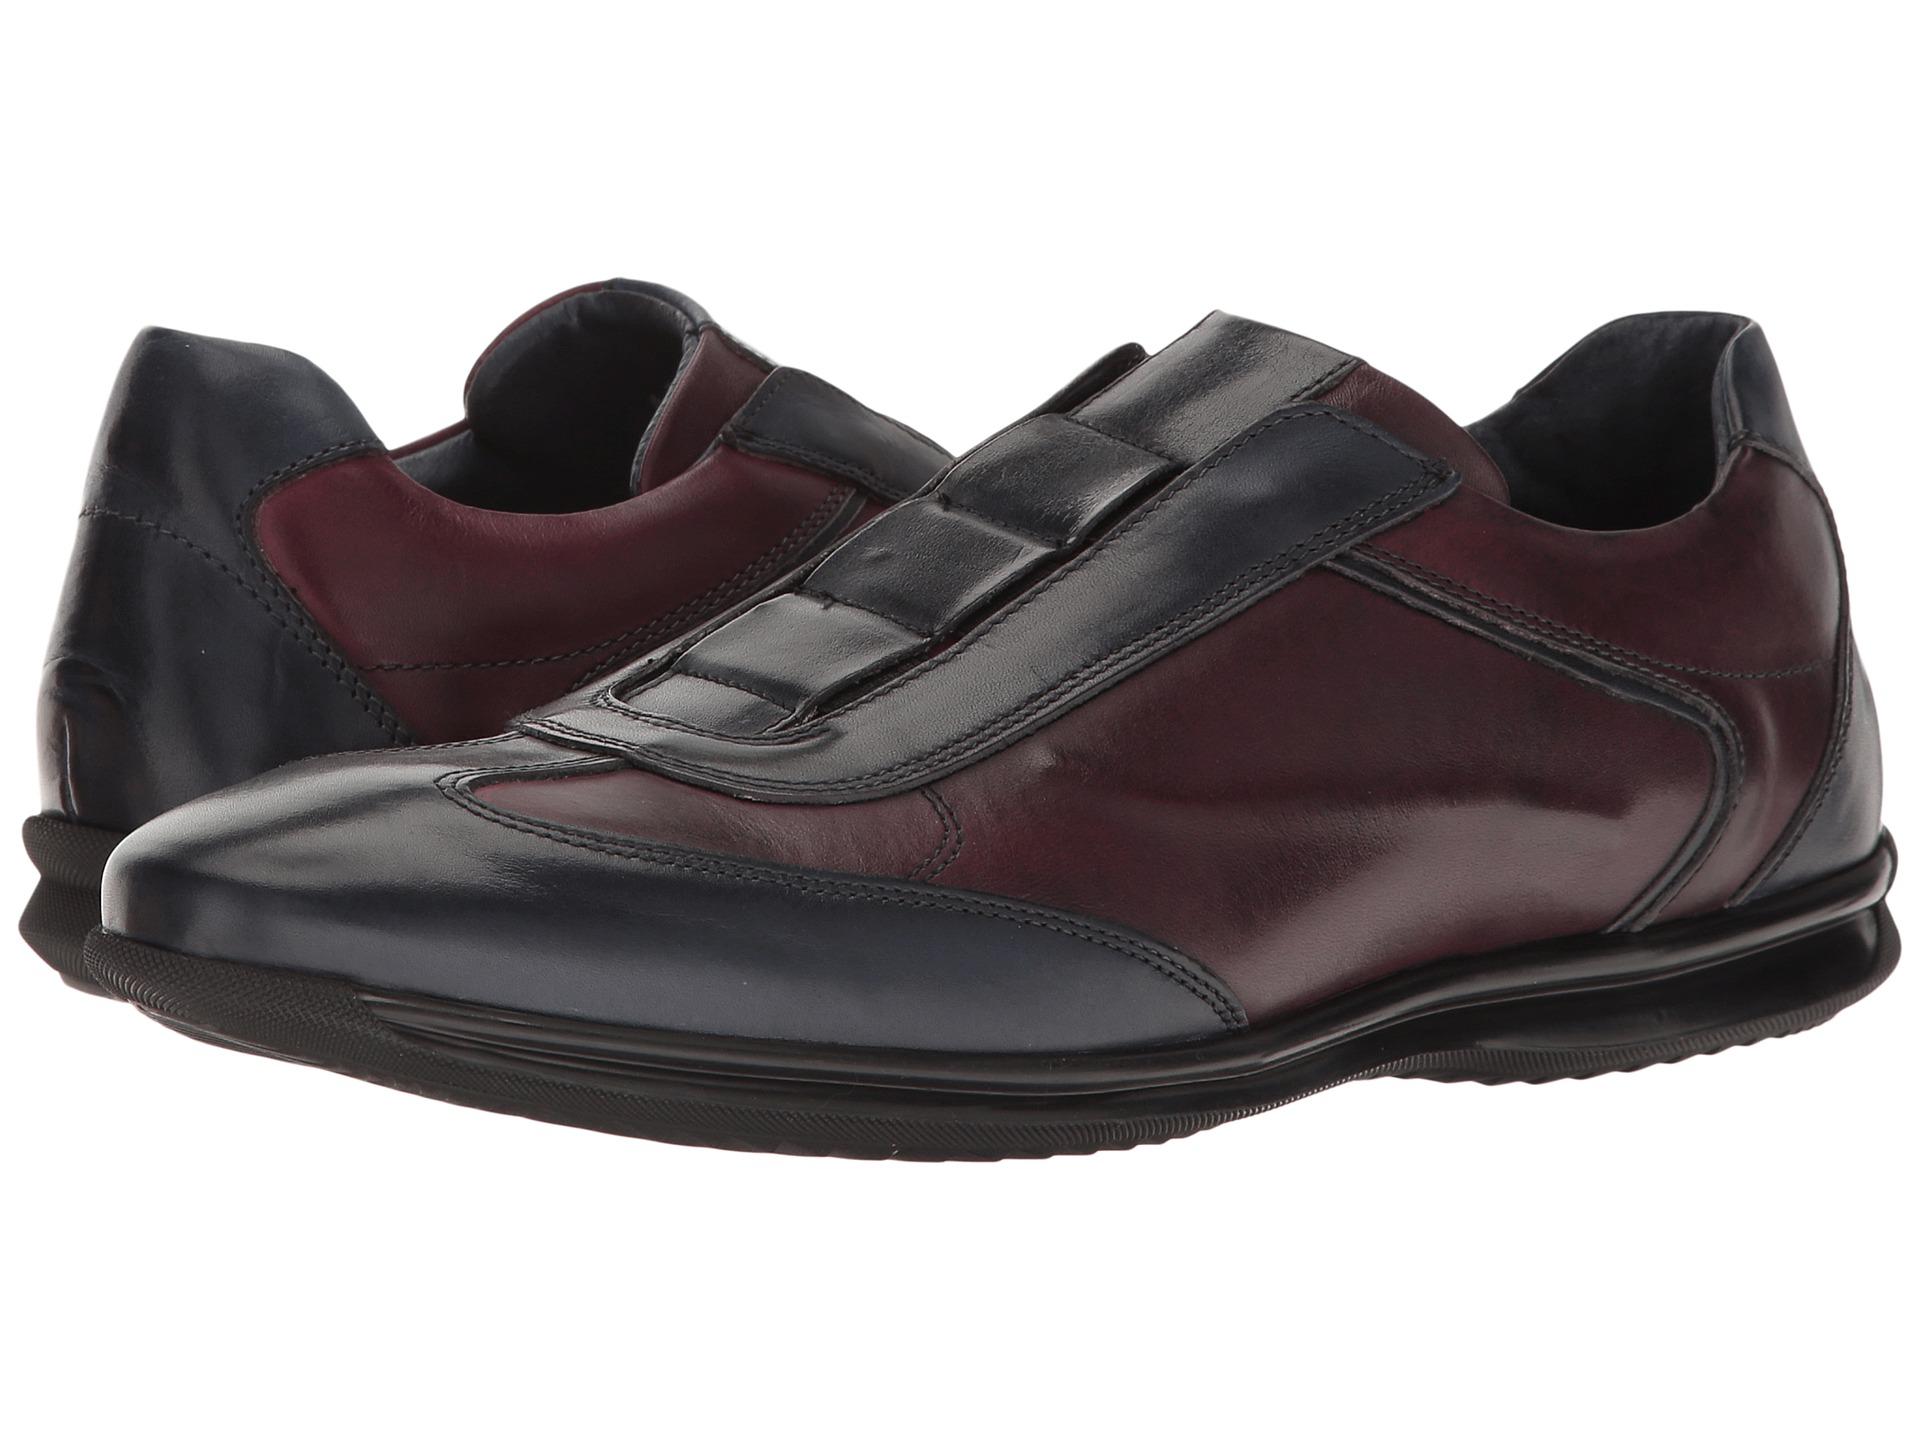 Bacco Bucci Shoes On Sale